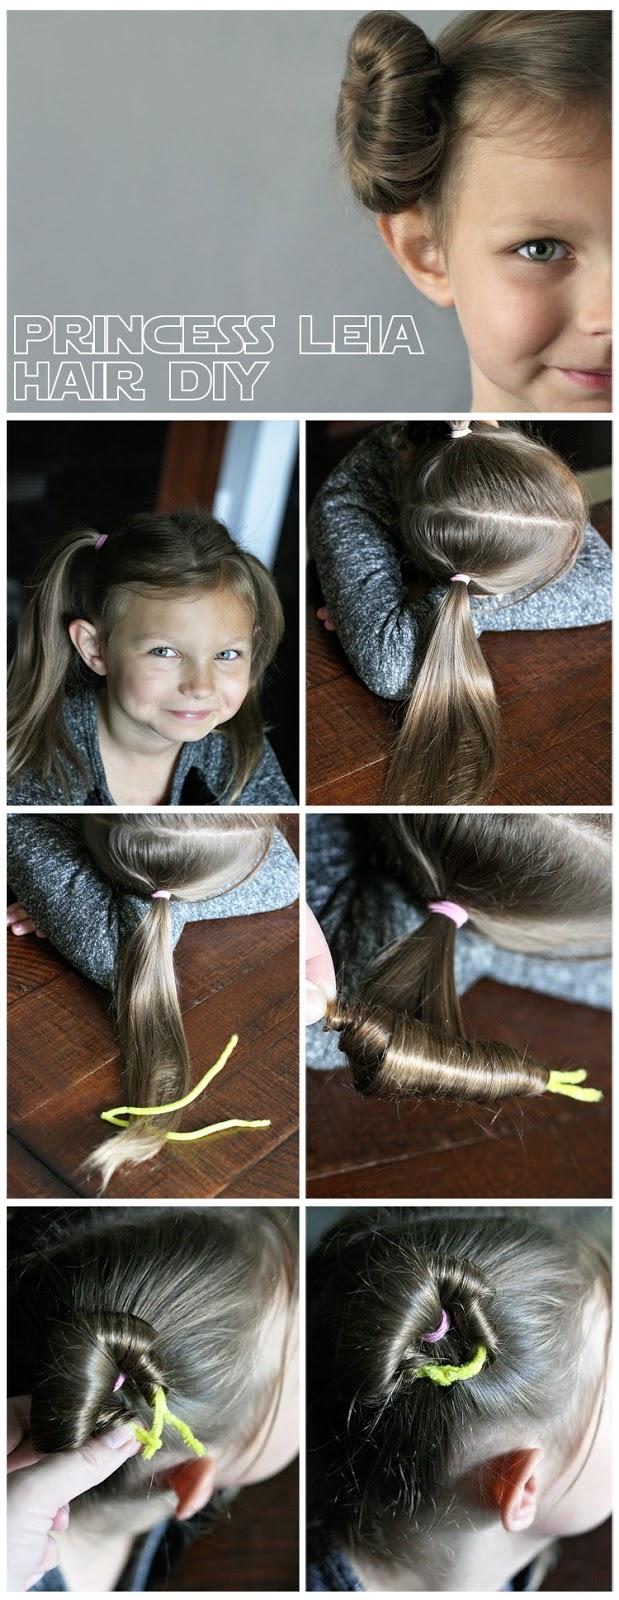 Princess Leia Hair Tutorial The Sewing Rabbit